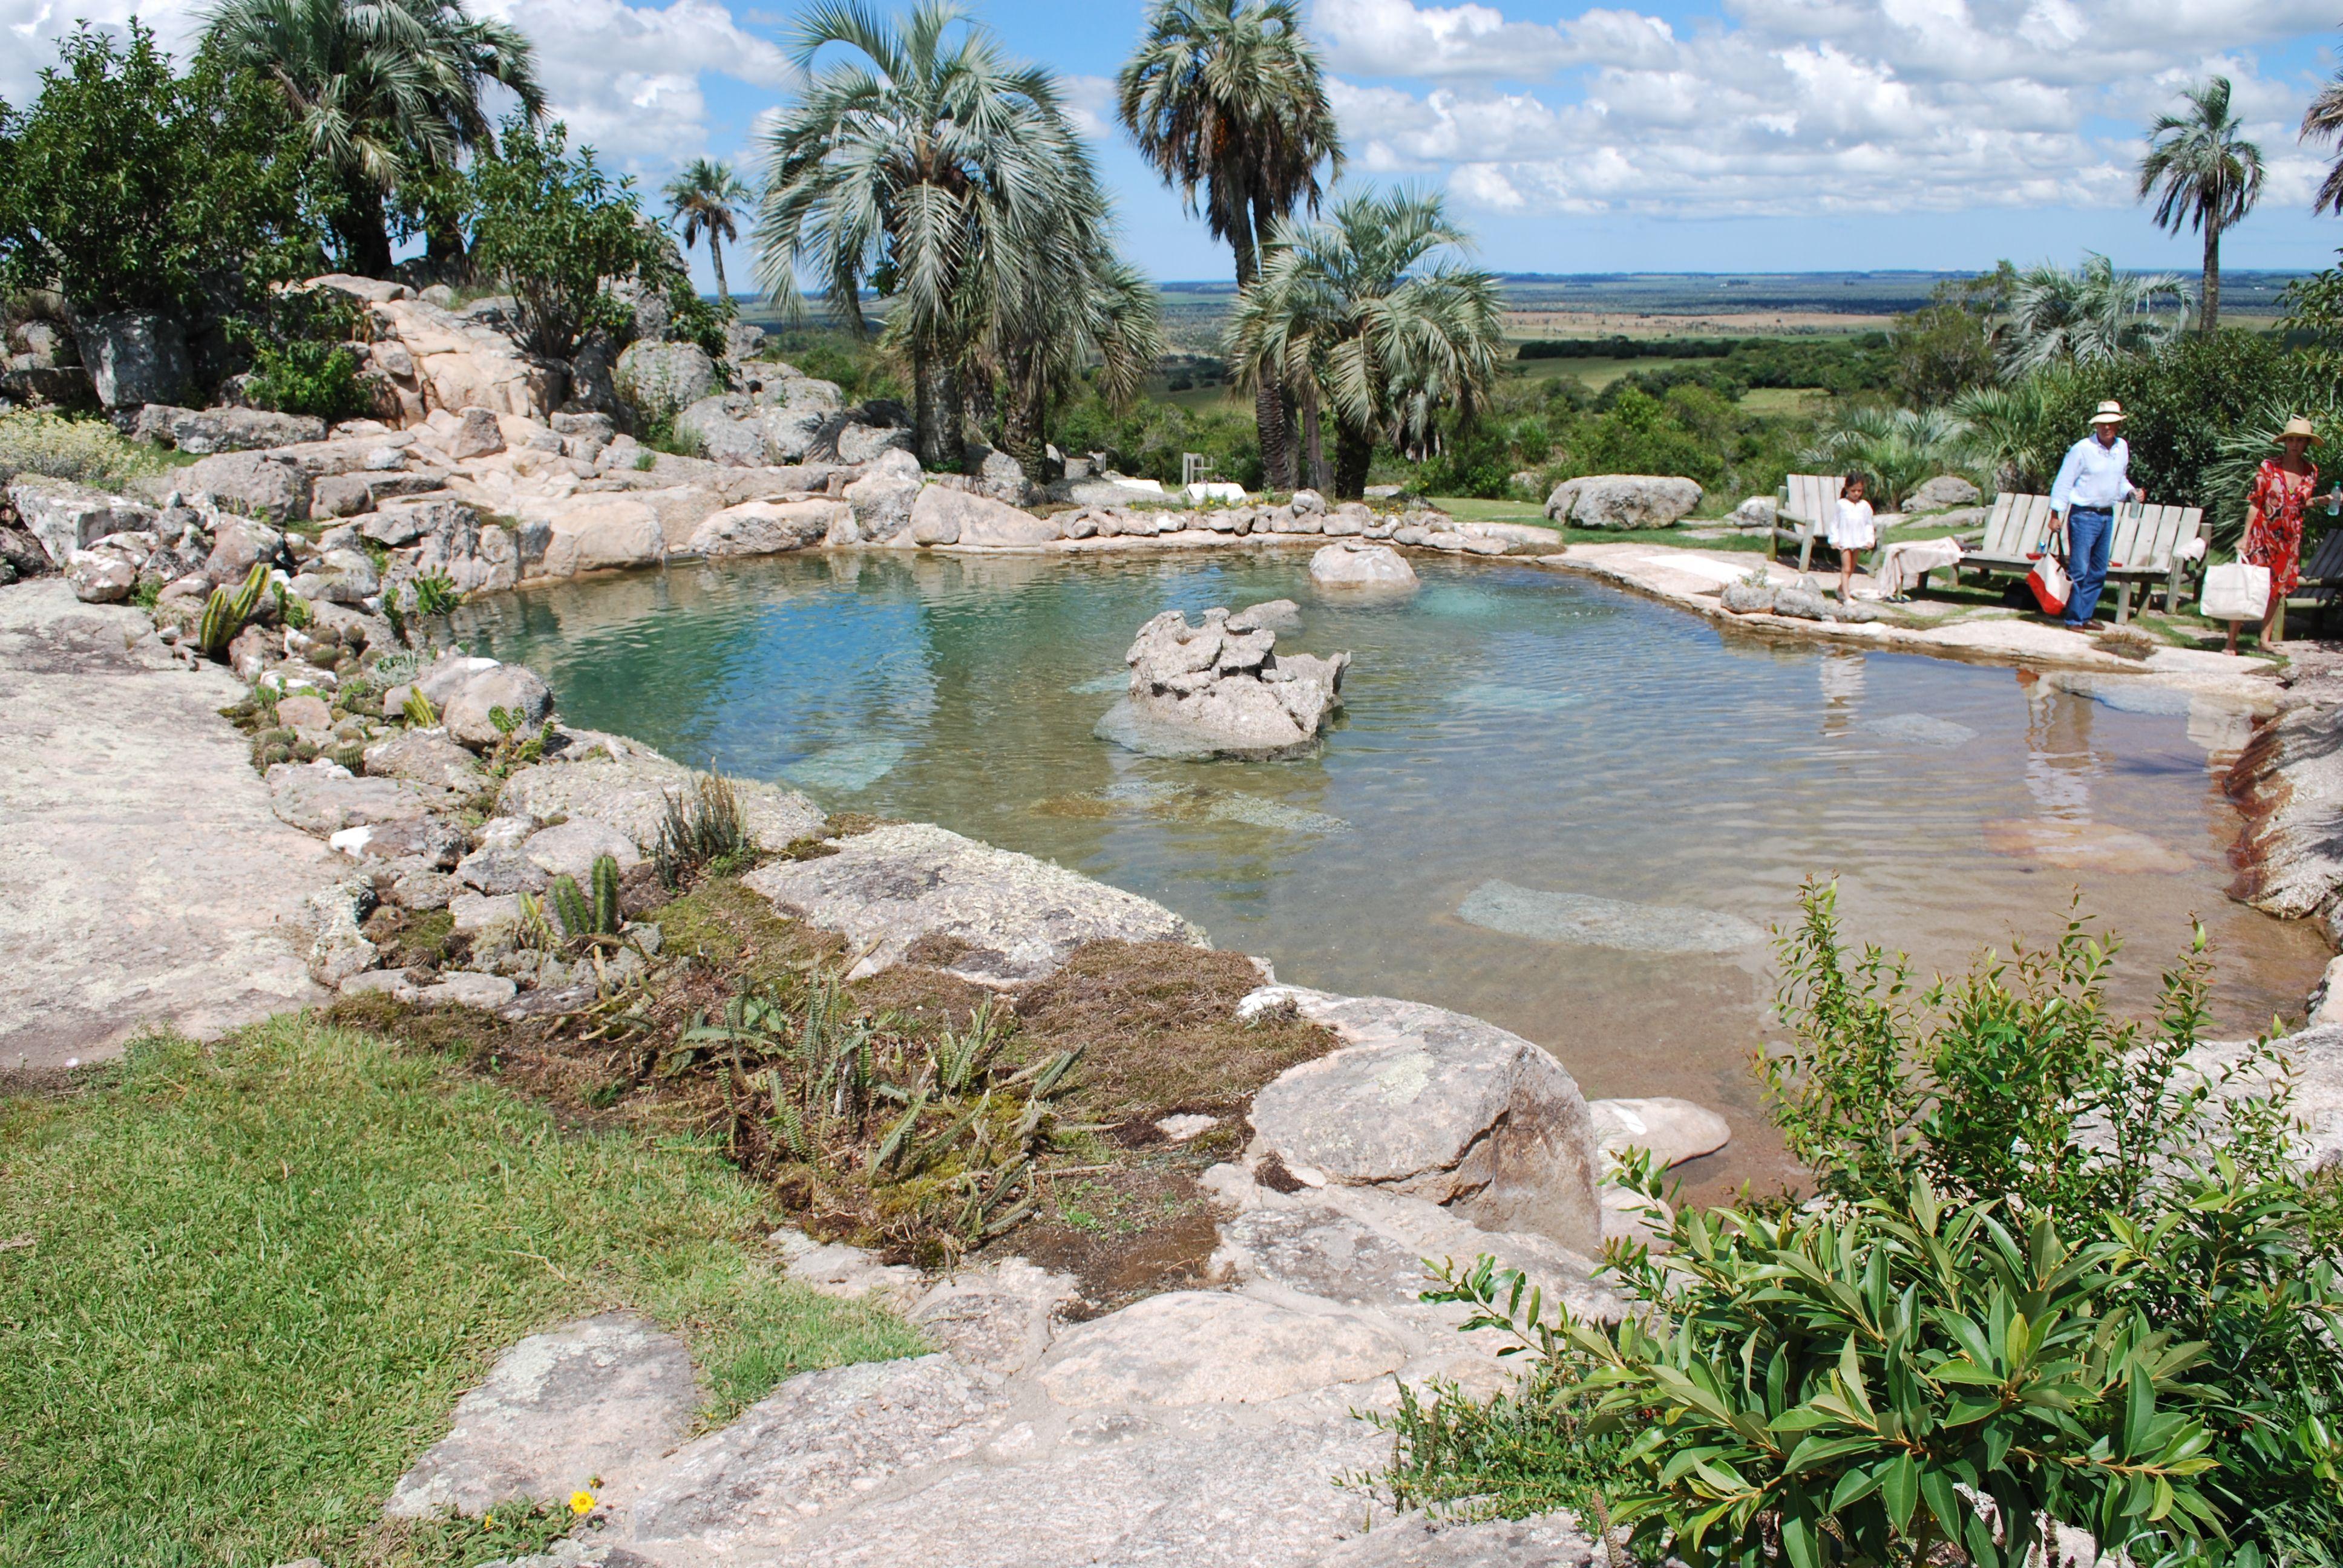 Piscina Pool Pileta En Castillos Uruguay Por El Artista Y Paisajista Martin Braun Foto Estudio Amalia Robredo Paisajes Piscinas Jardines